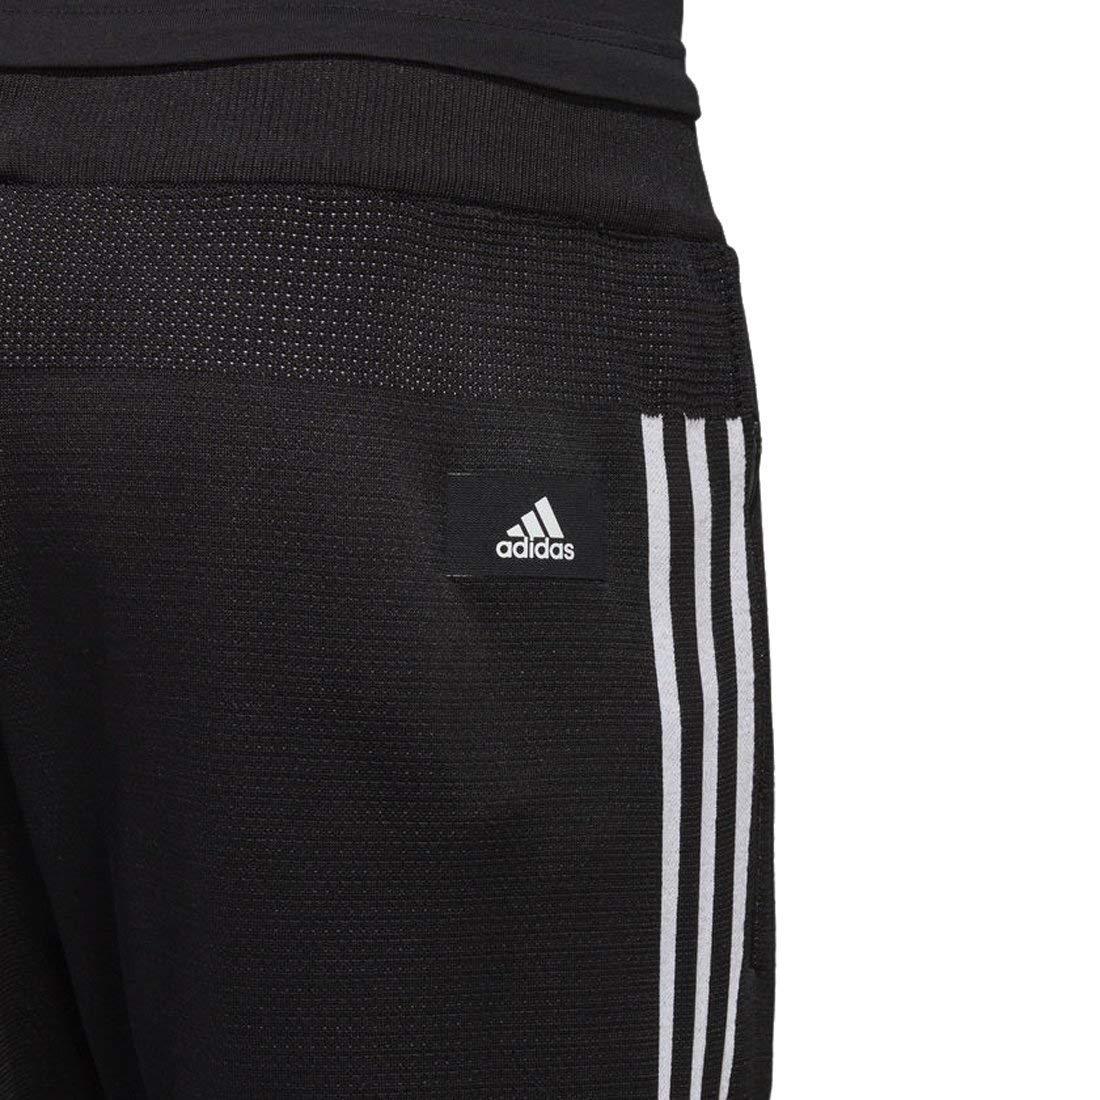 854ba3ae3d87 adidas Men's Athletics ID Knit Striker Pants Black at Amazon Men's Clothing  store: